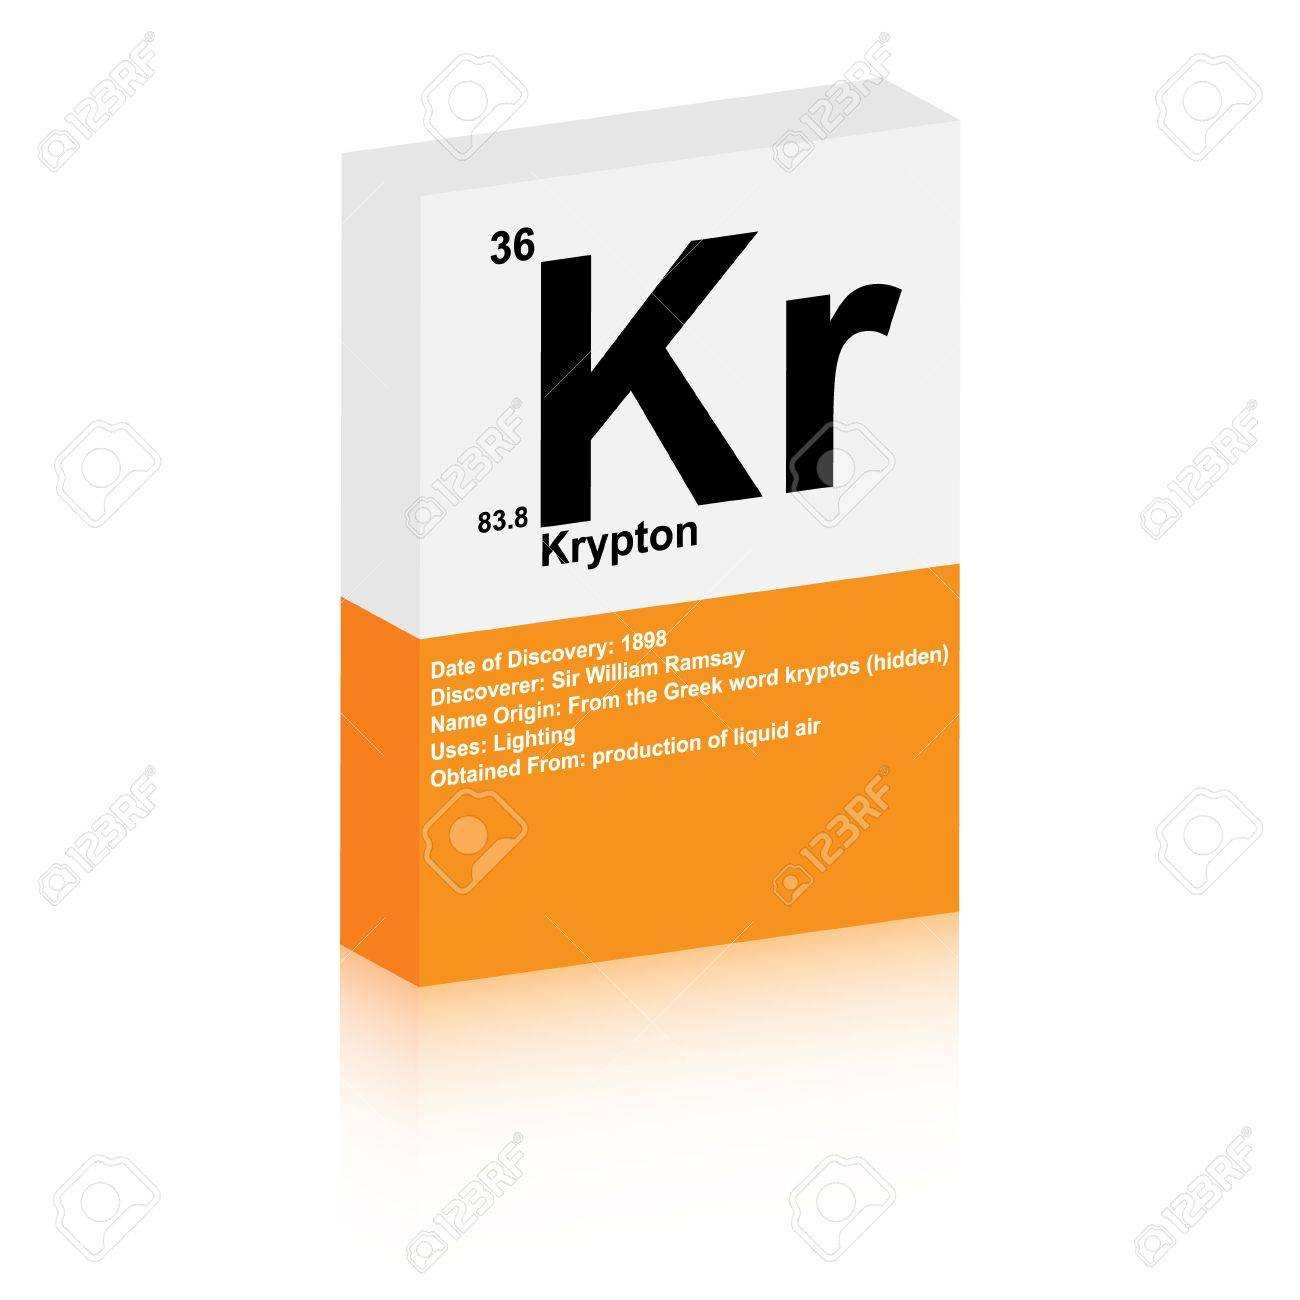 Krypton Symbol Royalty Free Cliparts Vectors And Stock